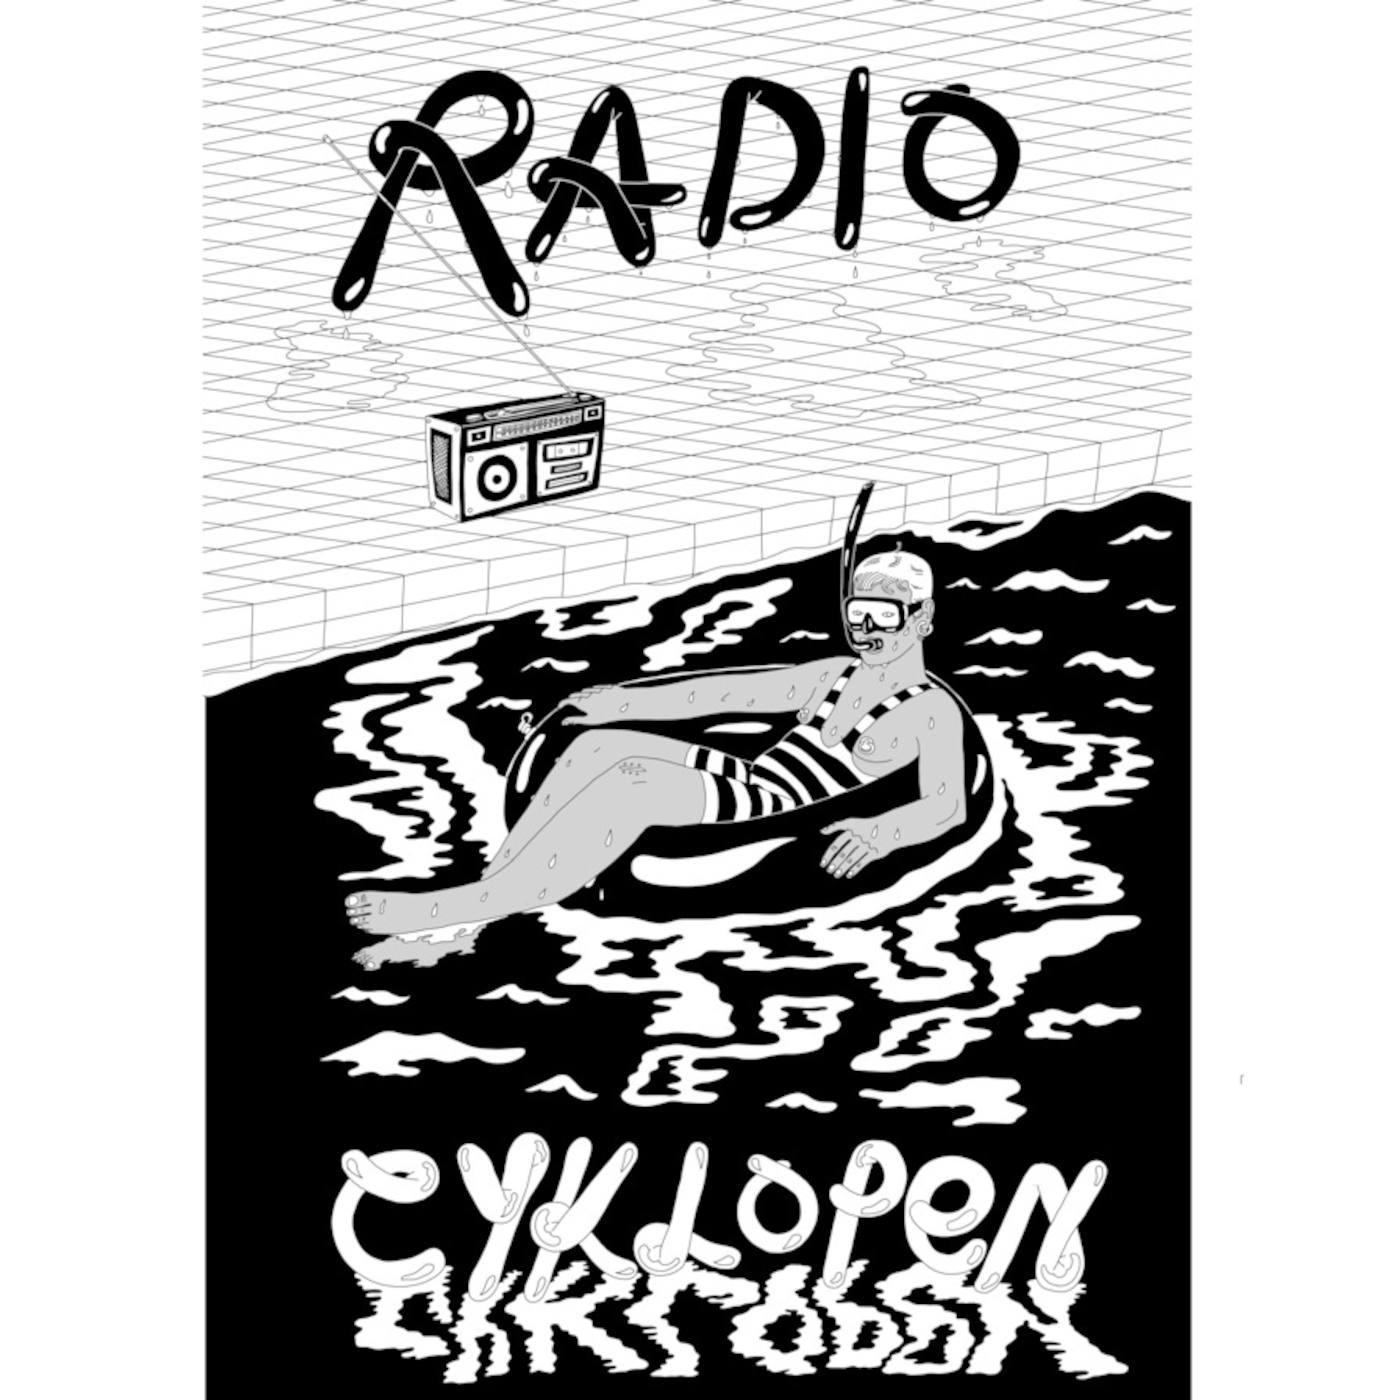 Radio Cyklopen #13: Islossning